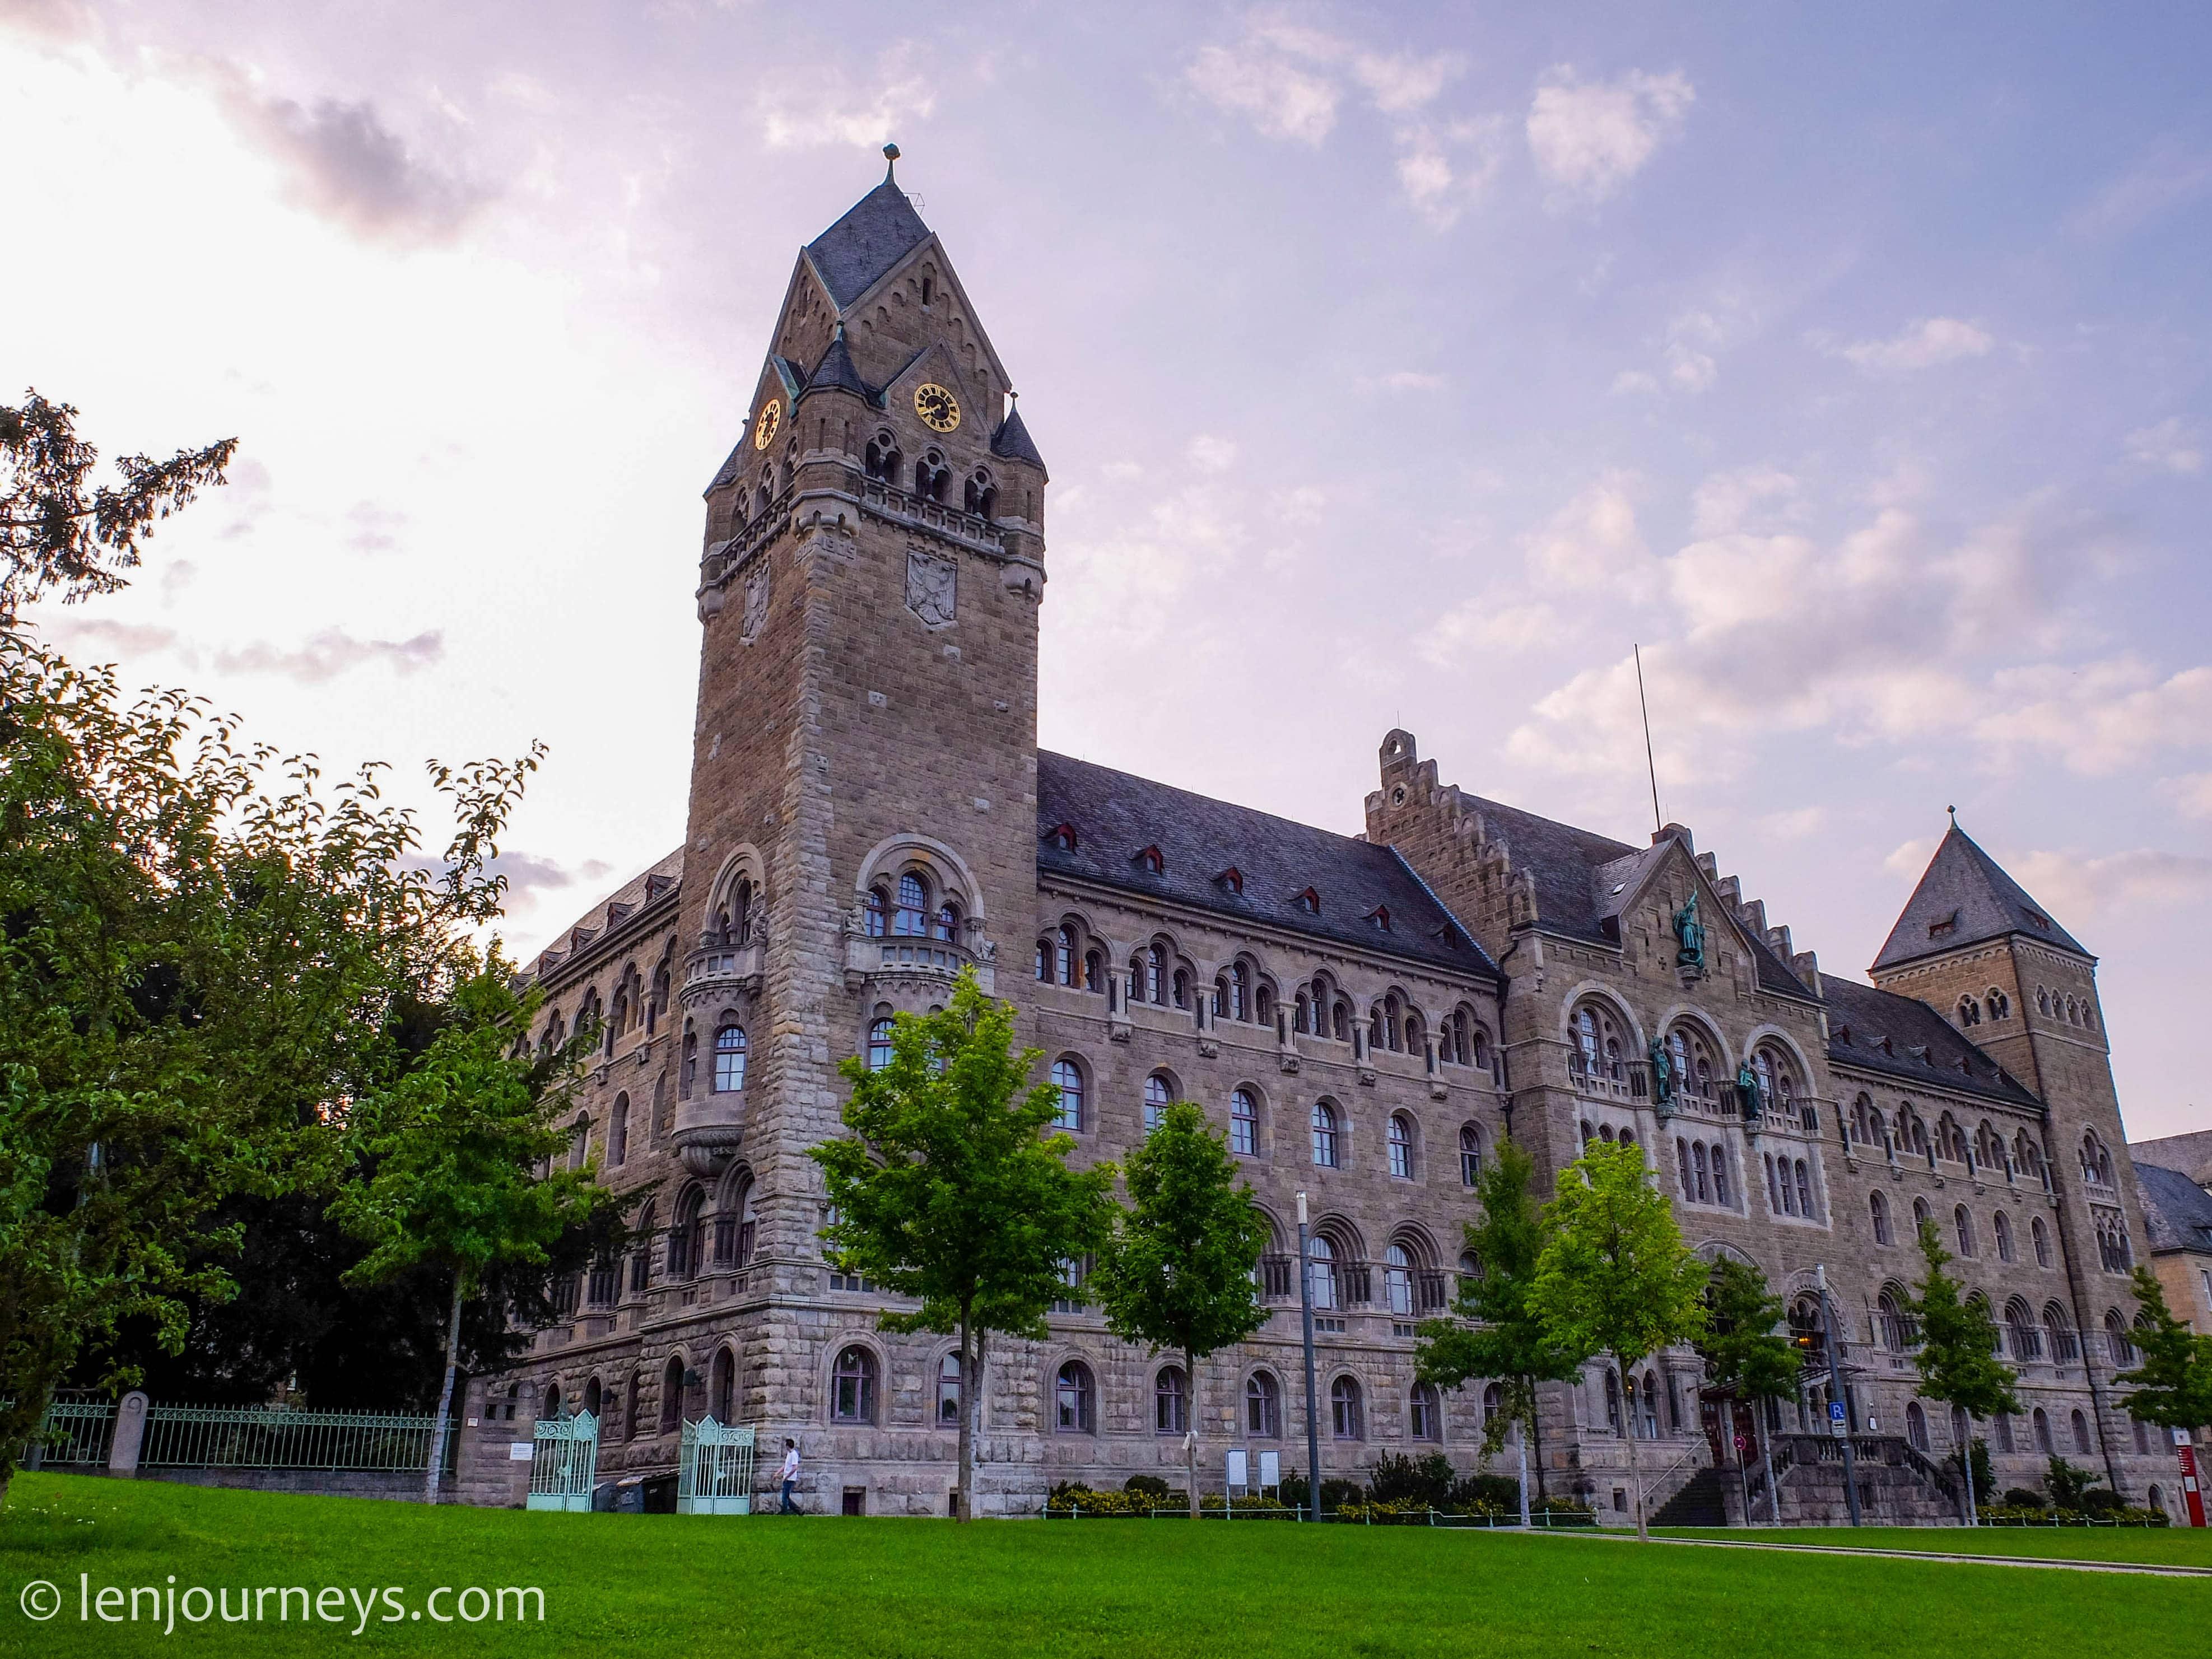 Historic building in Koblenz